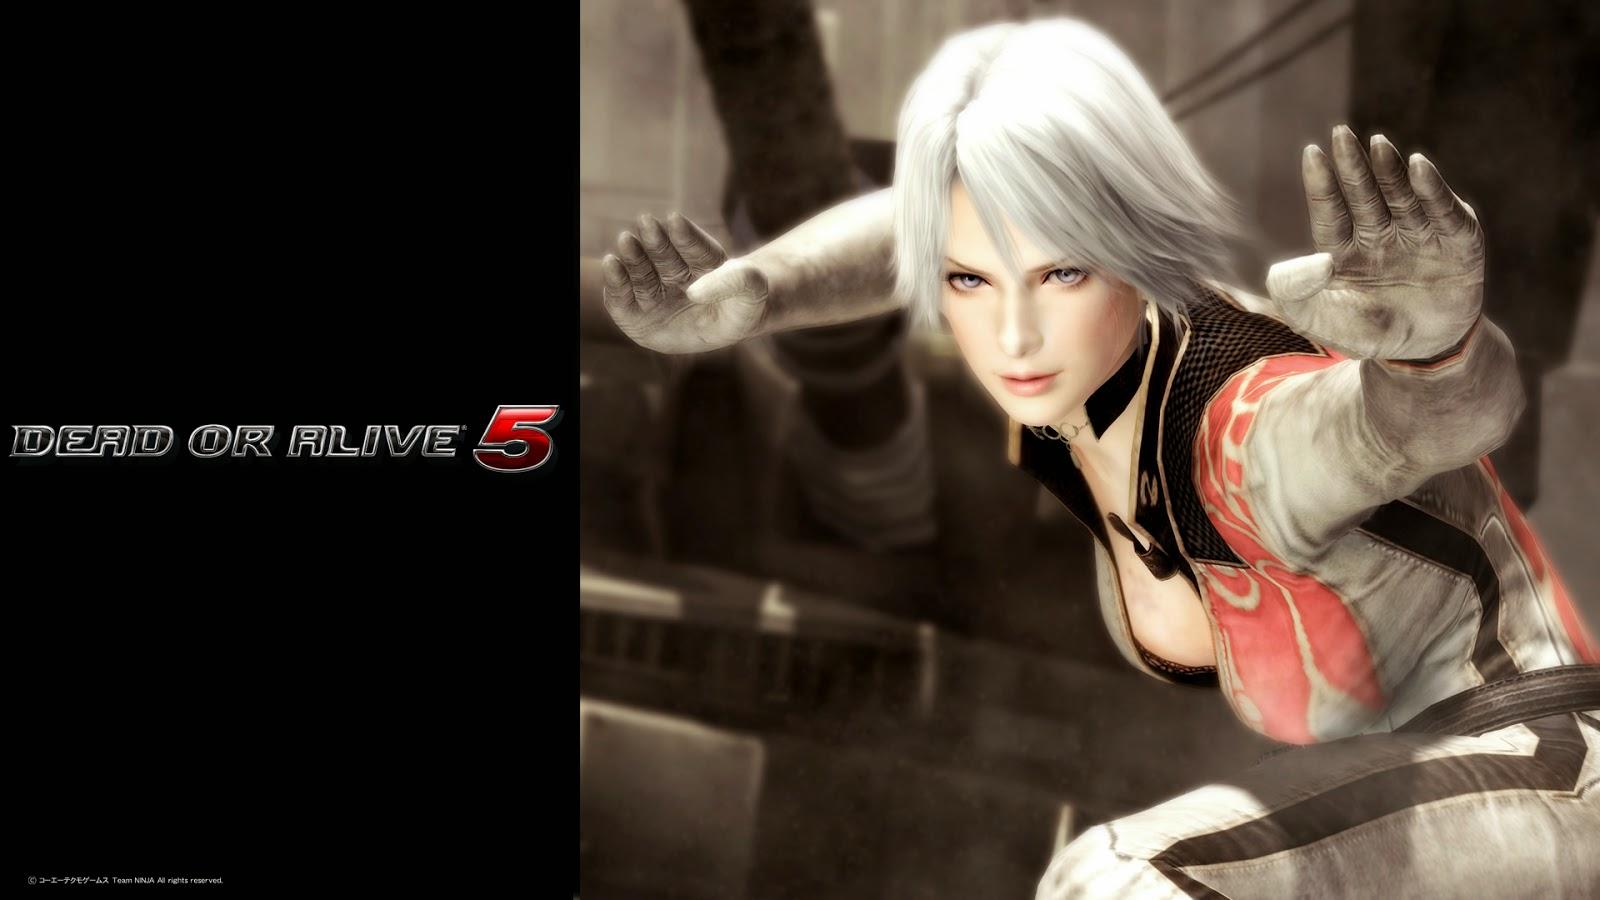 Весною 2015 года состоится релиз Dead or Alive 5 на Xbox One и Playstation 4